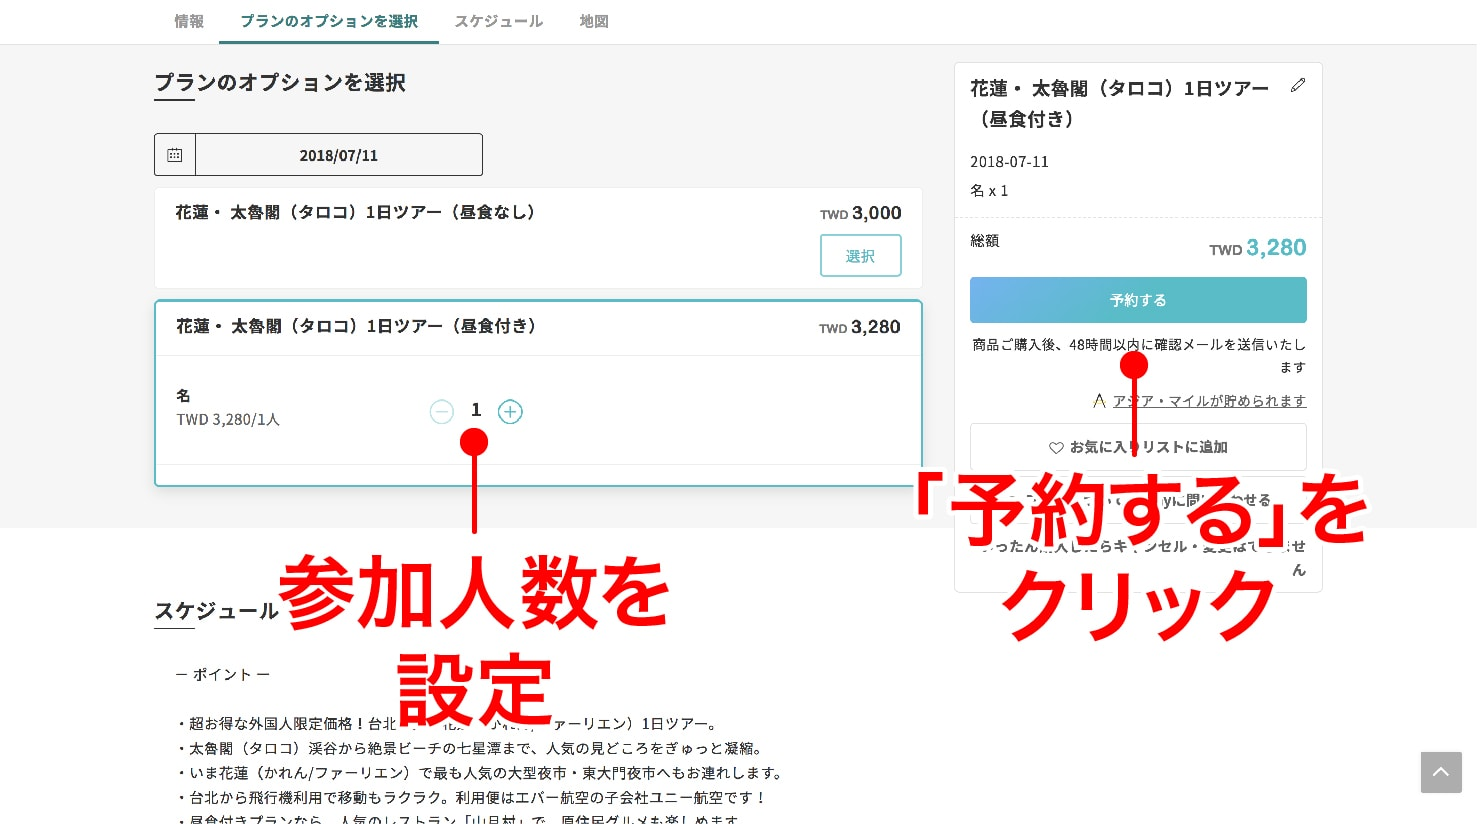 KKday外国人限定「花蓮・太魯閣(タロコ)日帰りツアー」の予約画面5